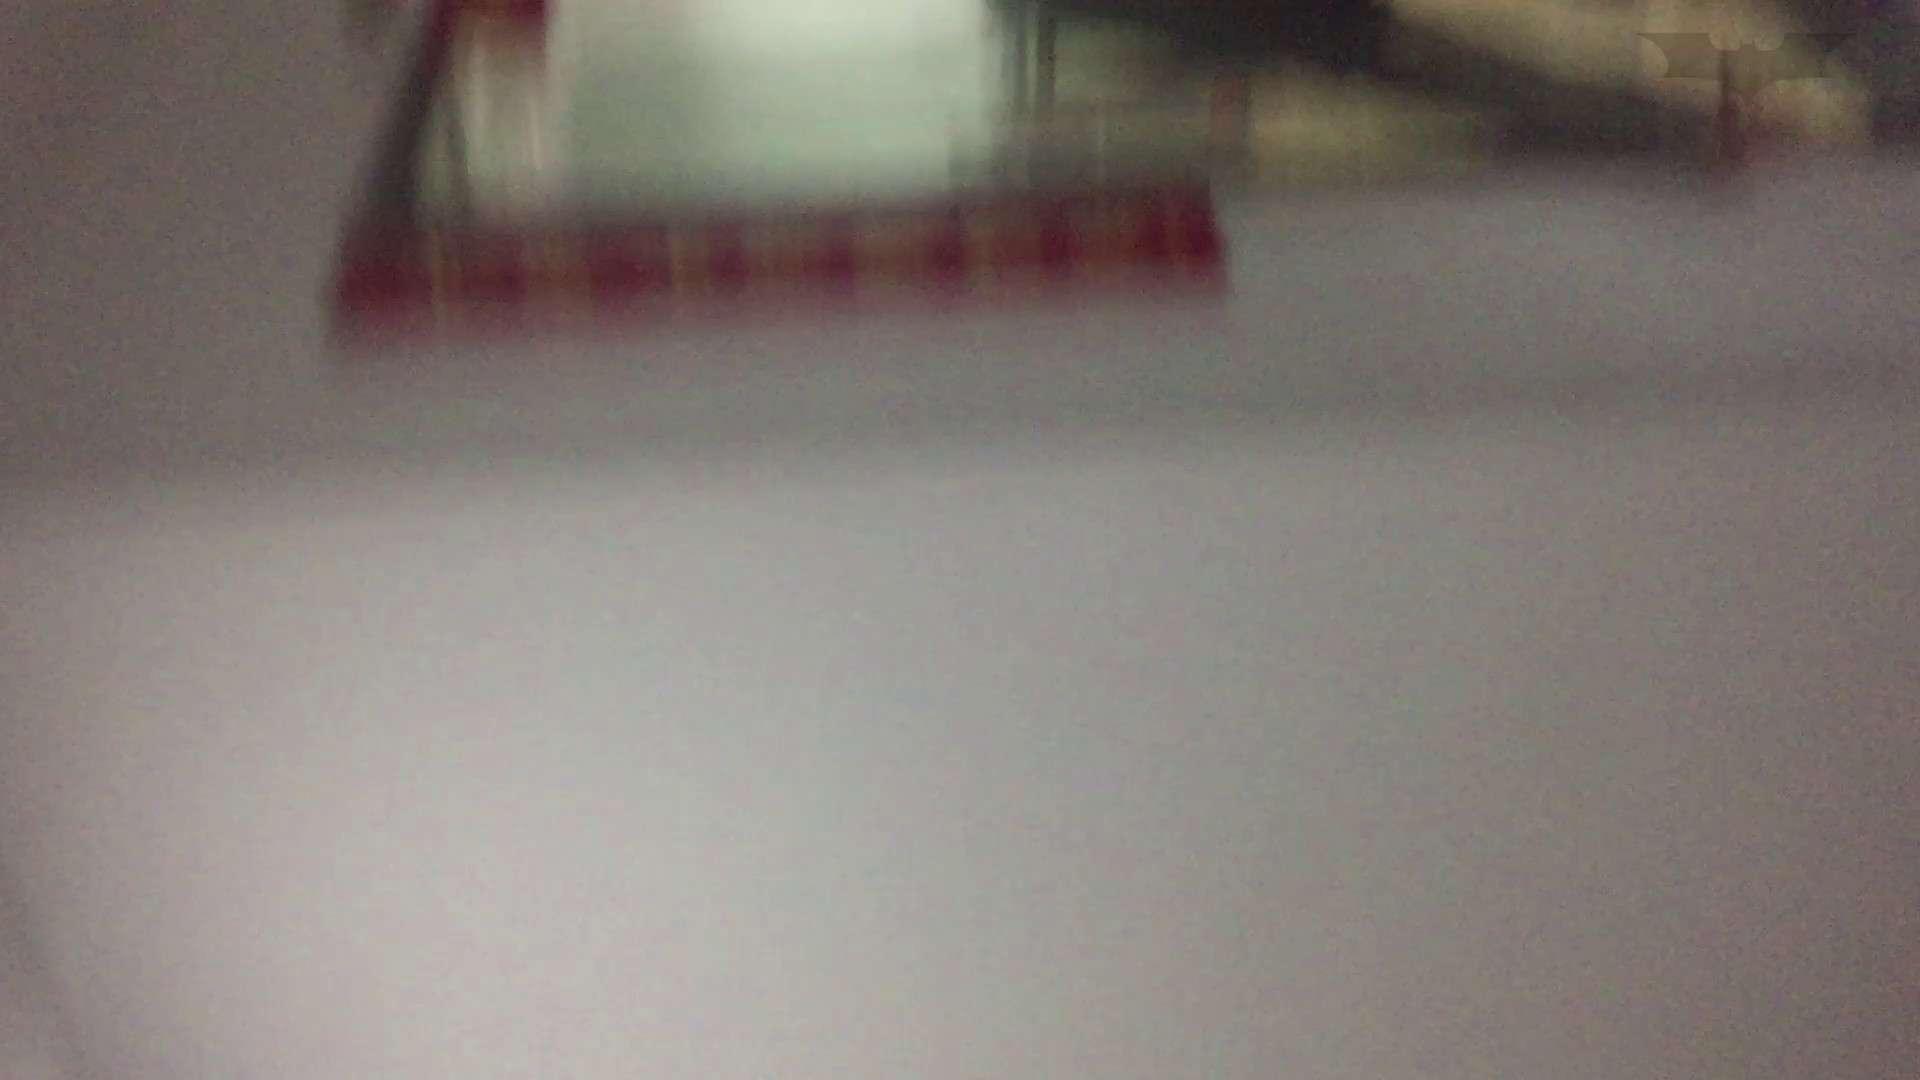 JD盗撮 美女の洗面所の秘密 Vol.70 美肌 ワレメ無修正動画無料 89画像 70